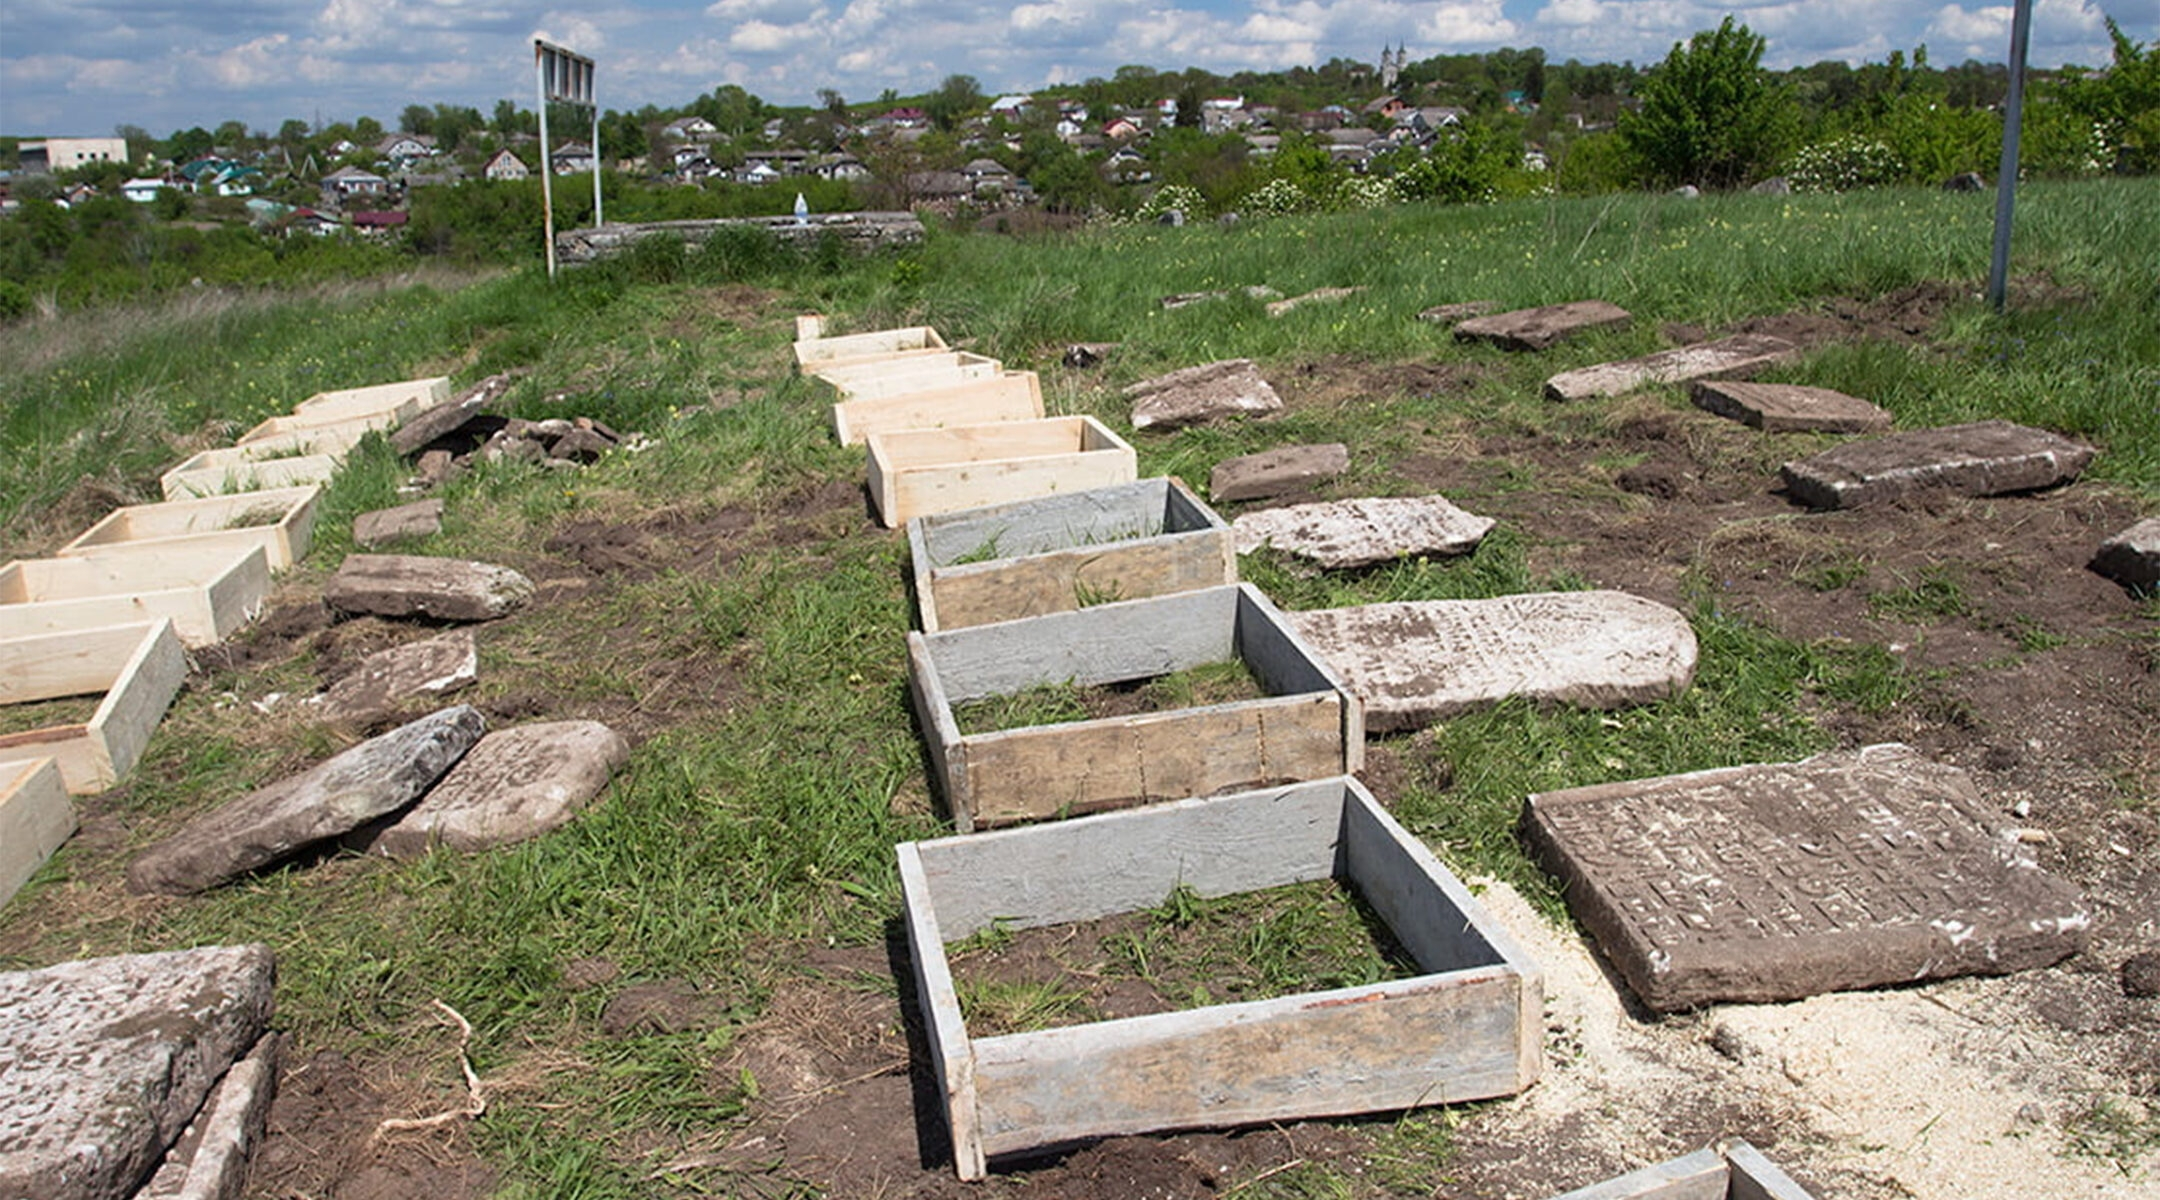 Renovation works at the Jewish cemetery in Sataniv, Ukraine in 2021. (Dmitry Polyukhovich/Jewish Heritage Europe)